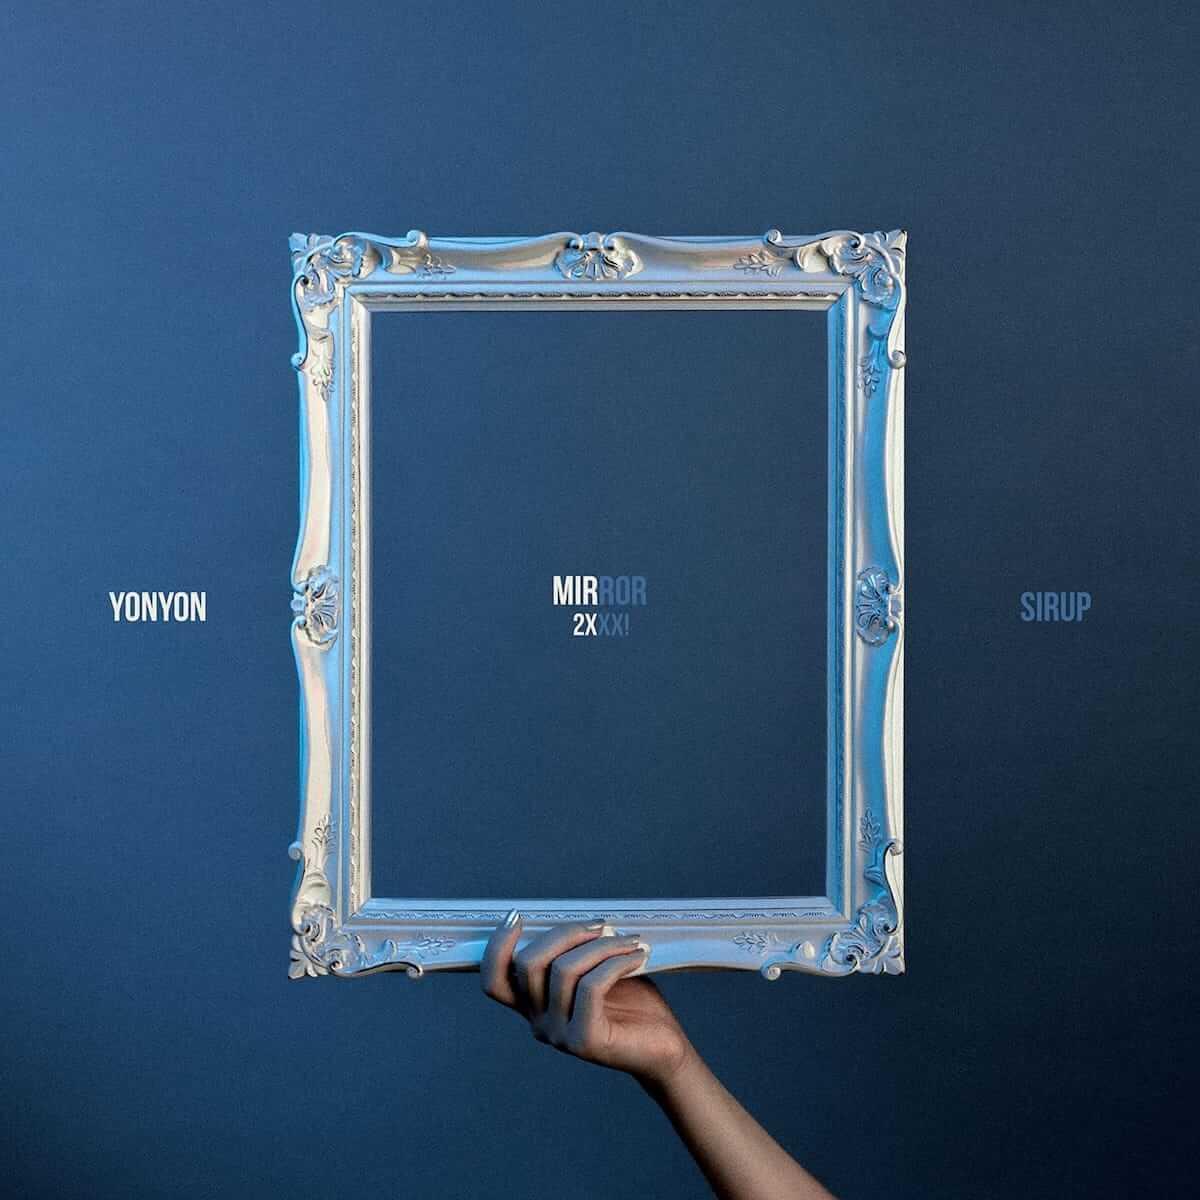 YonYon×SIRUP×2xxx! YonYonによる日本と韓国を繋ぐ新たなプロジェクト「The Link」の第2弾配信開始 music180701_thelink_1-1200x1200